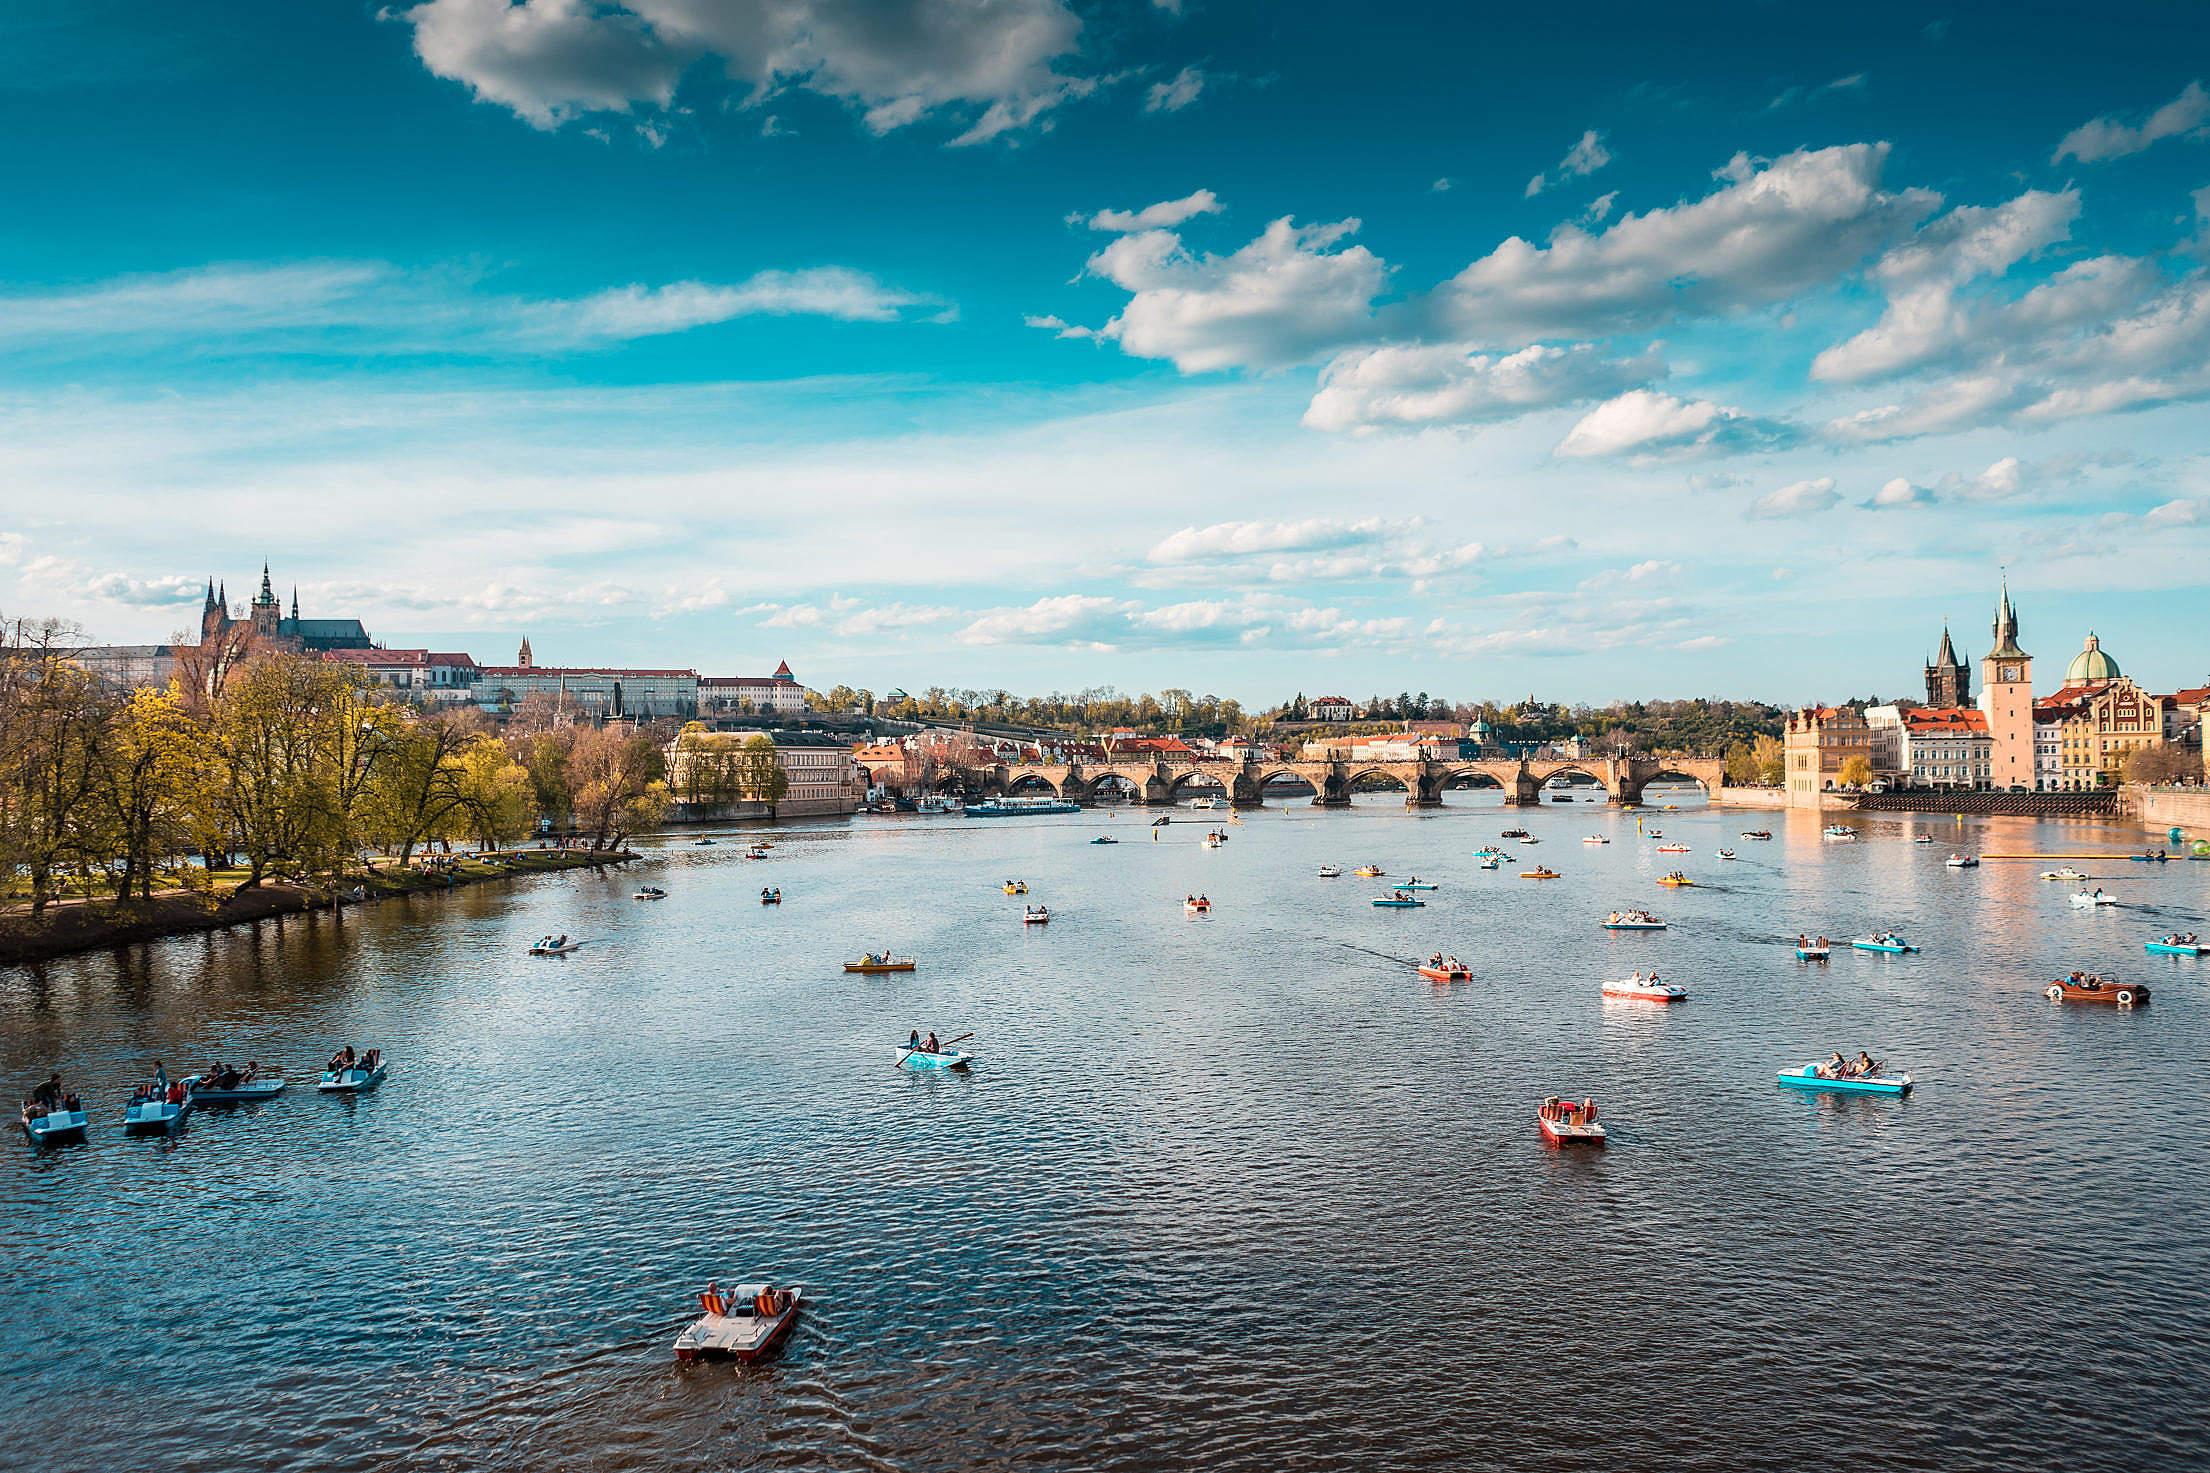 Normal Life Around Charles Bridge in Prague City Free Stock Photo